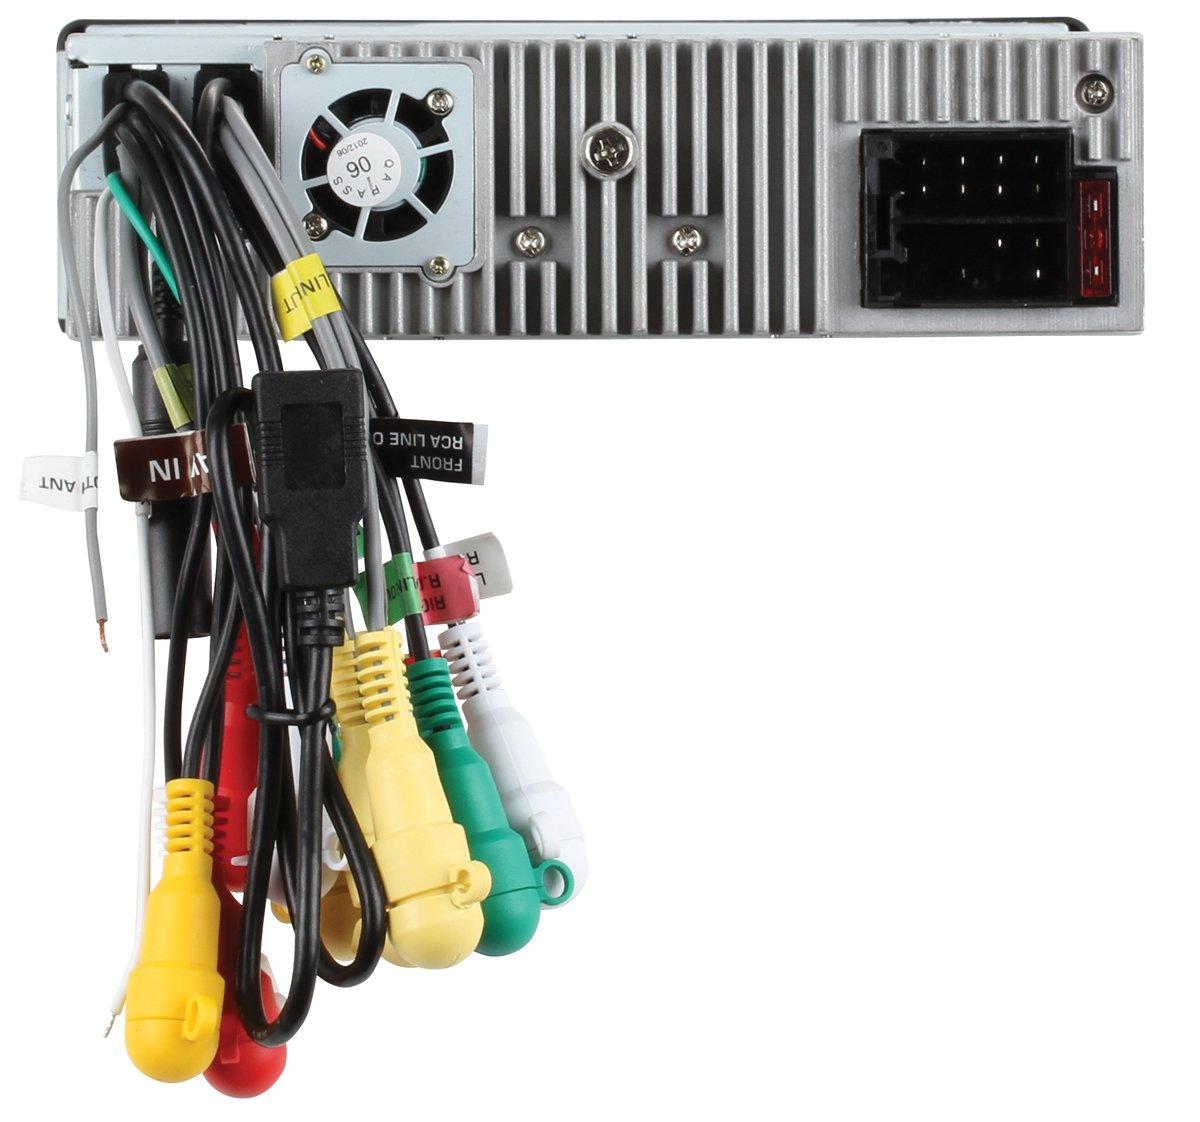 71Z5C9P3tRL._SL1200_ boss bv7942 wiring harness wiring diagrams boss bv9986bi wiring harness at gsmx.co